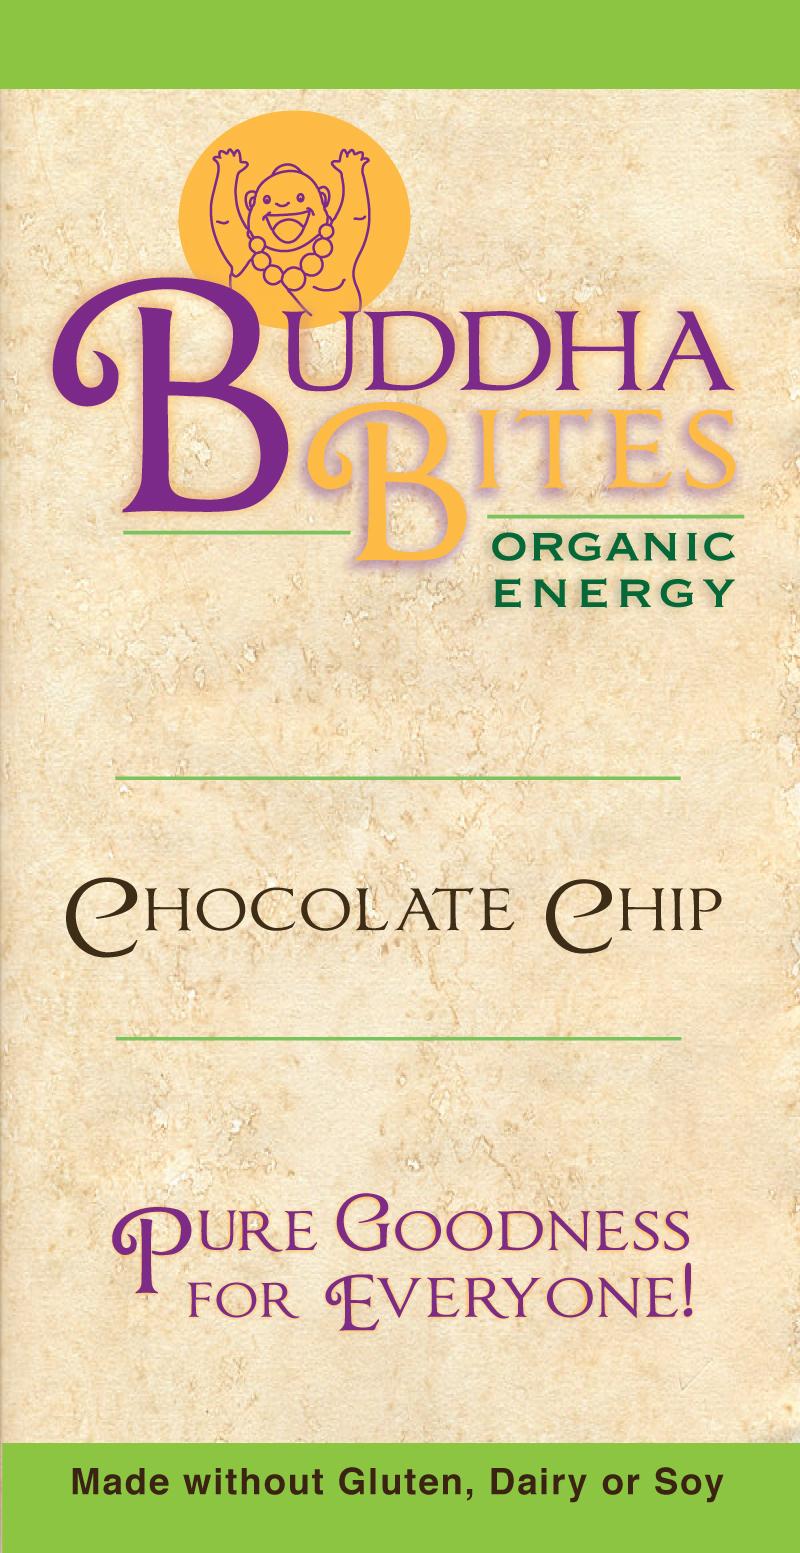 BuddhaBites-Chocolate-Chip-Front-No-Weight.jpg